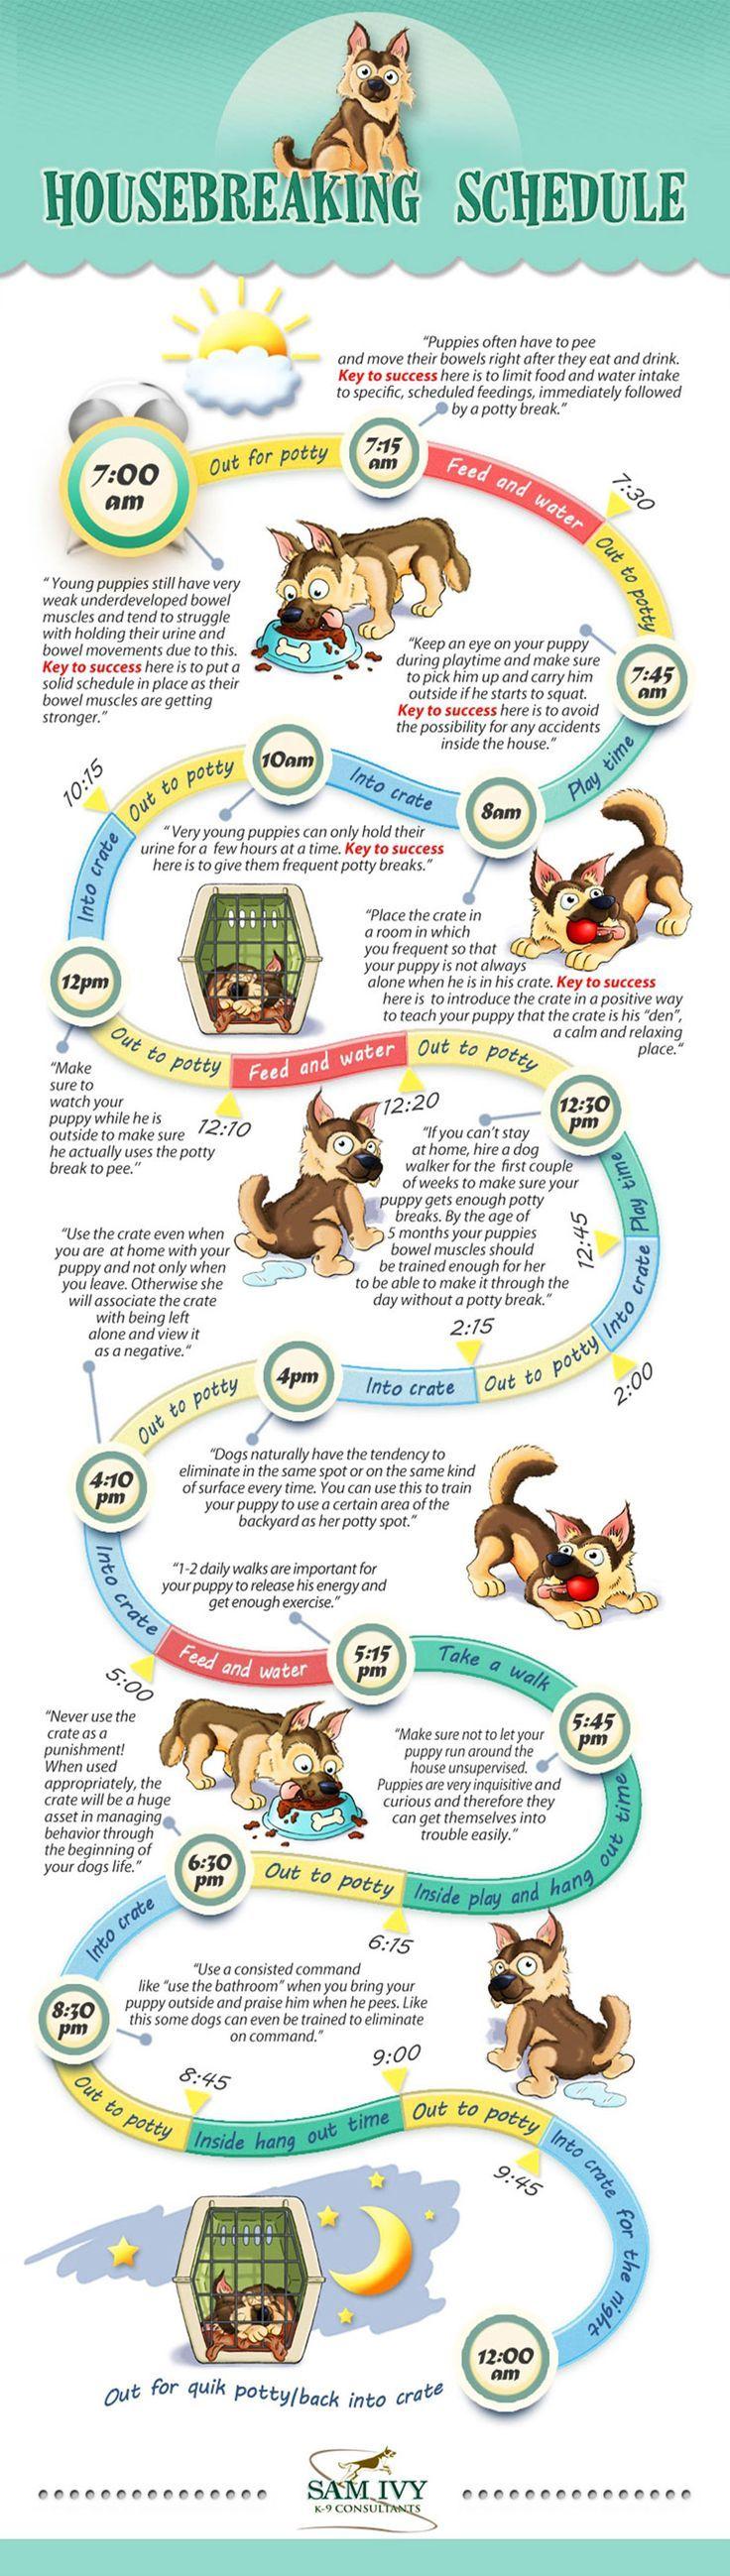 best boys want a dog images on pinterest custom dog kennel diy